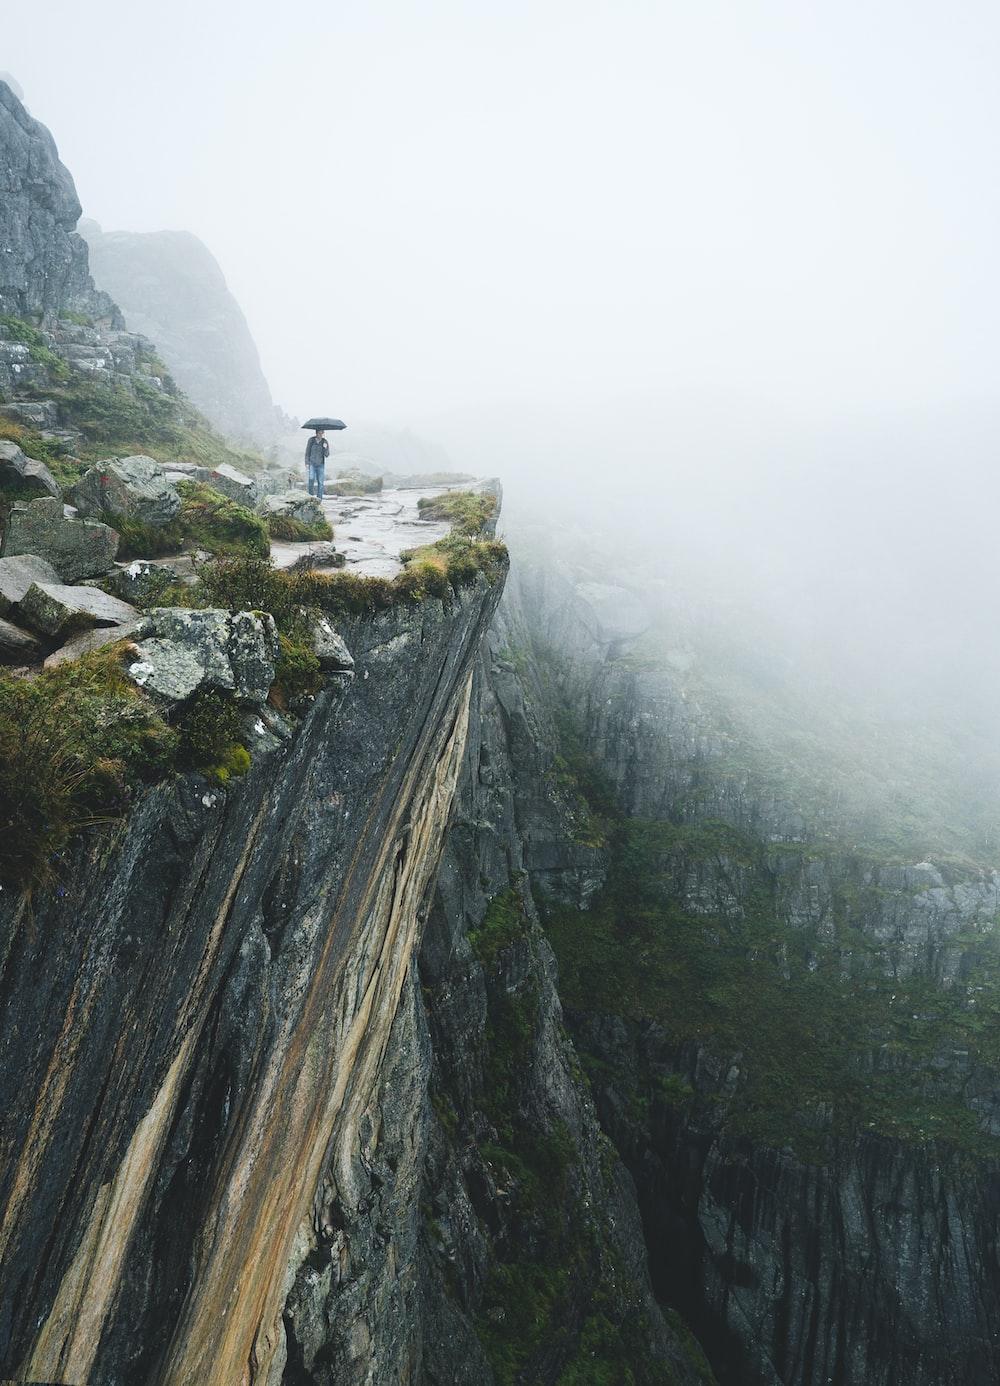 person walking near cliff